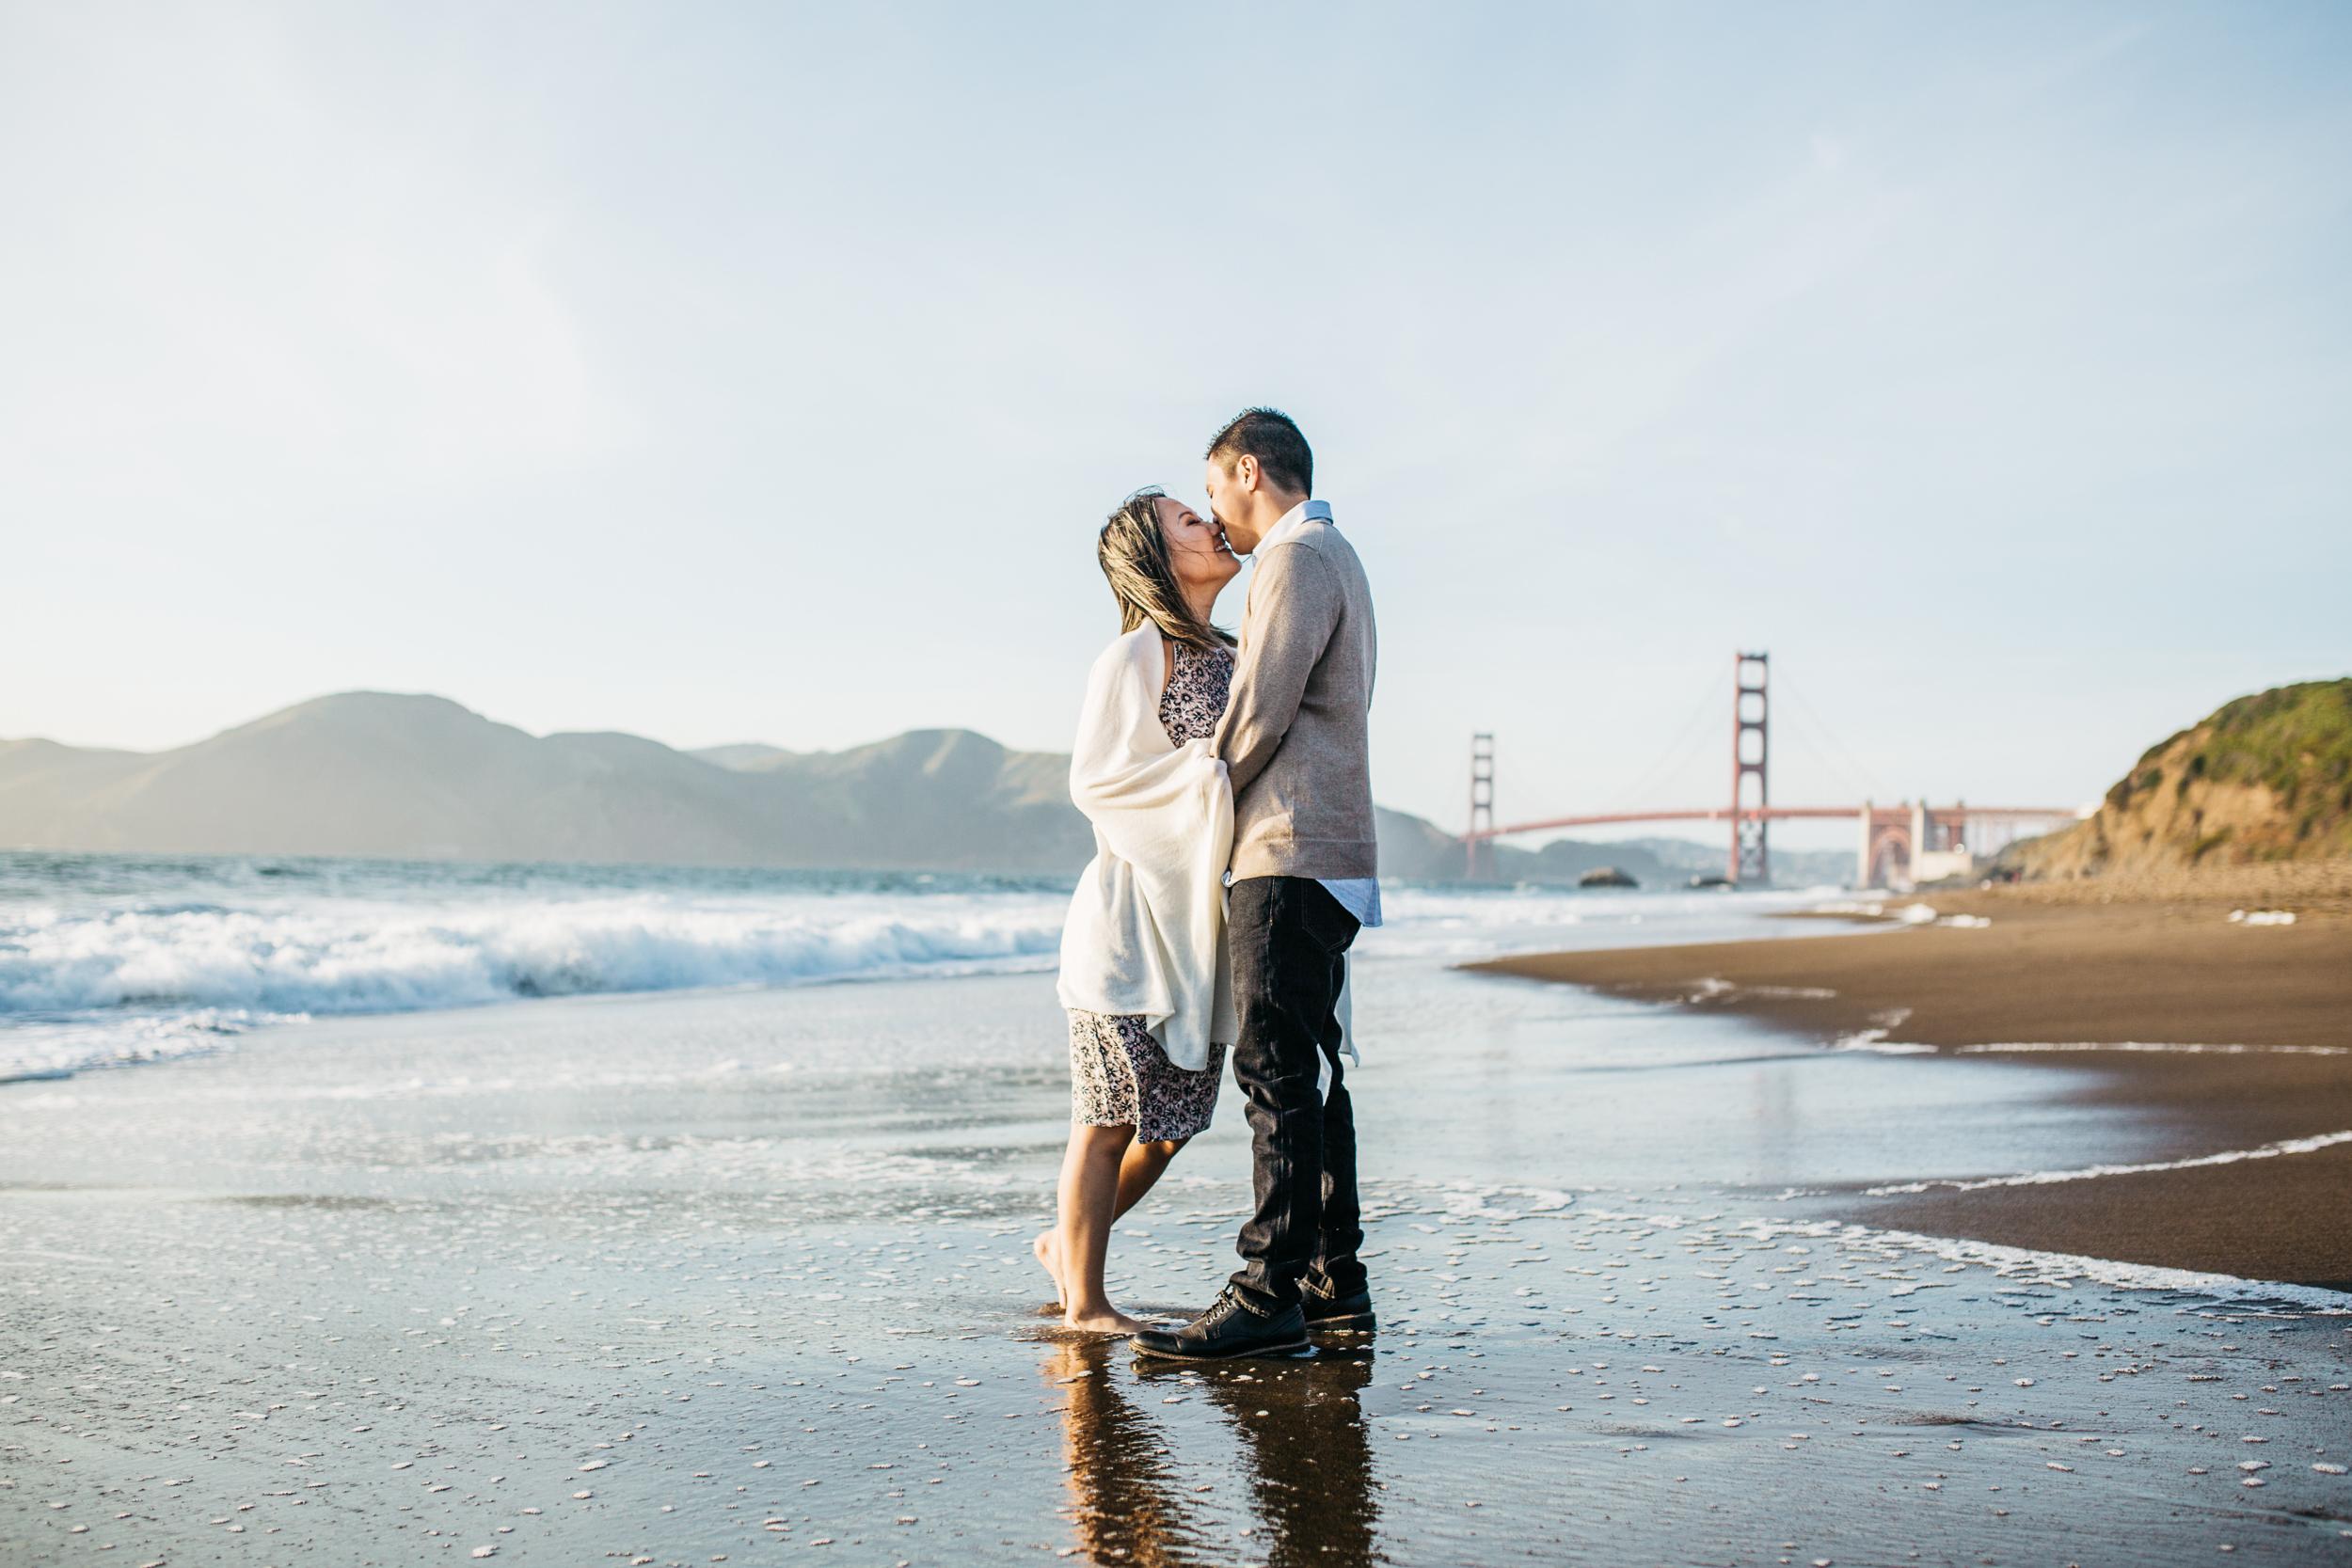 Engagement Photos-Ranalla Photo and Films-79.jpg